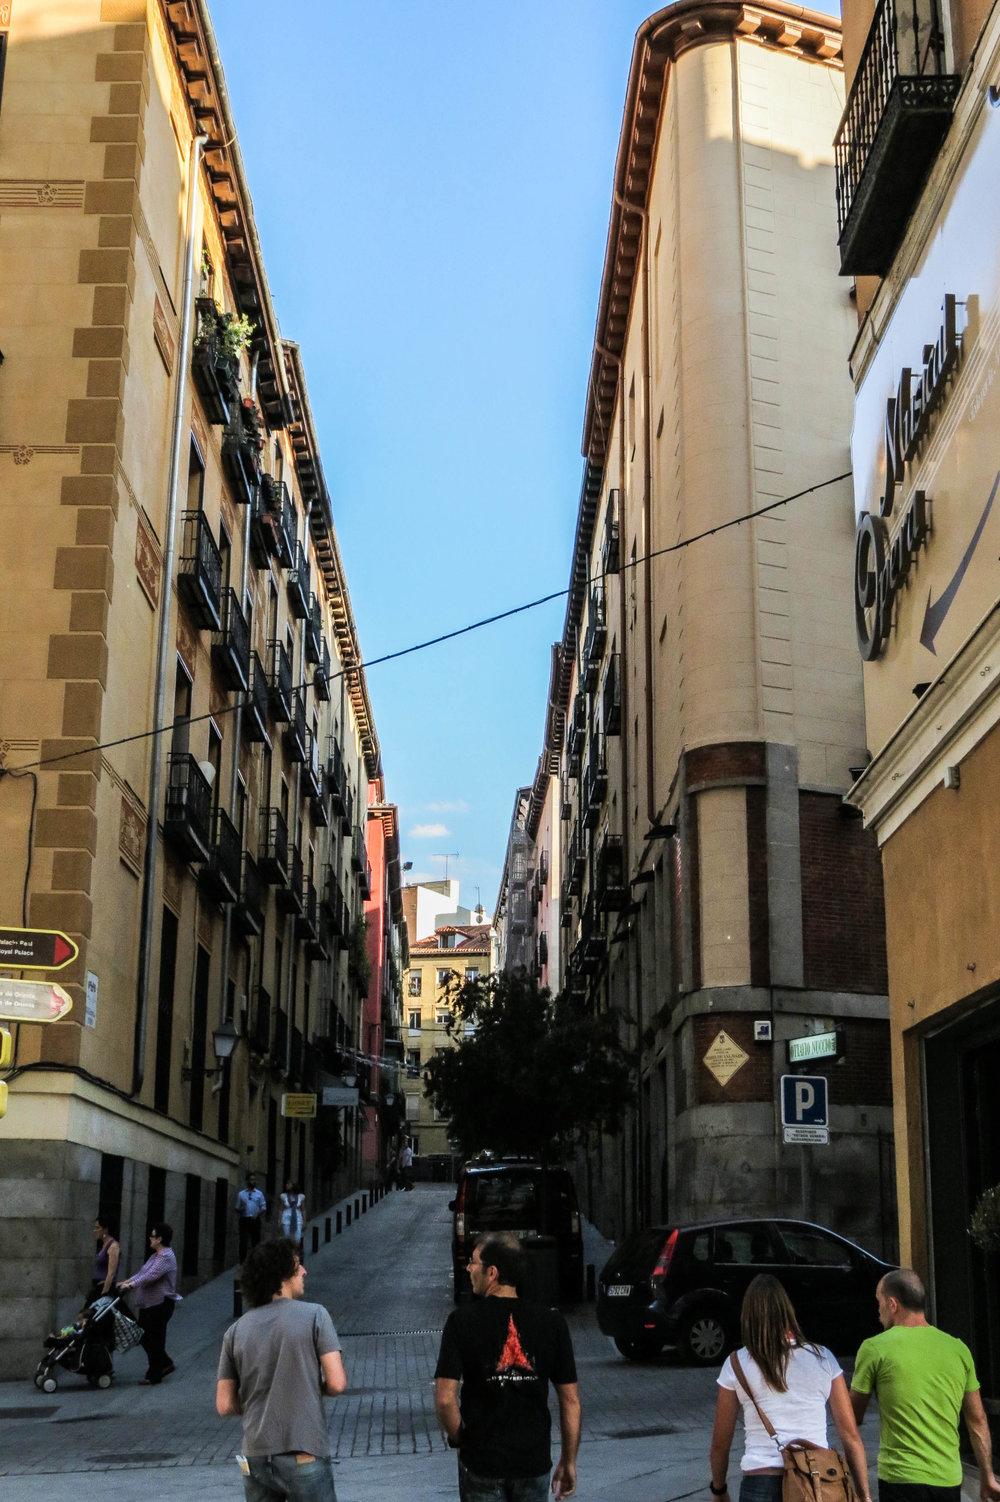 madrid-spain-streets-summer-30.jpg